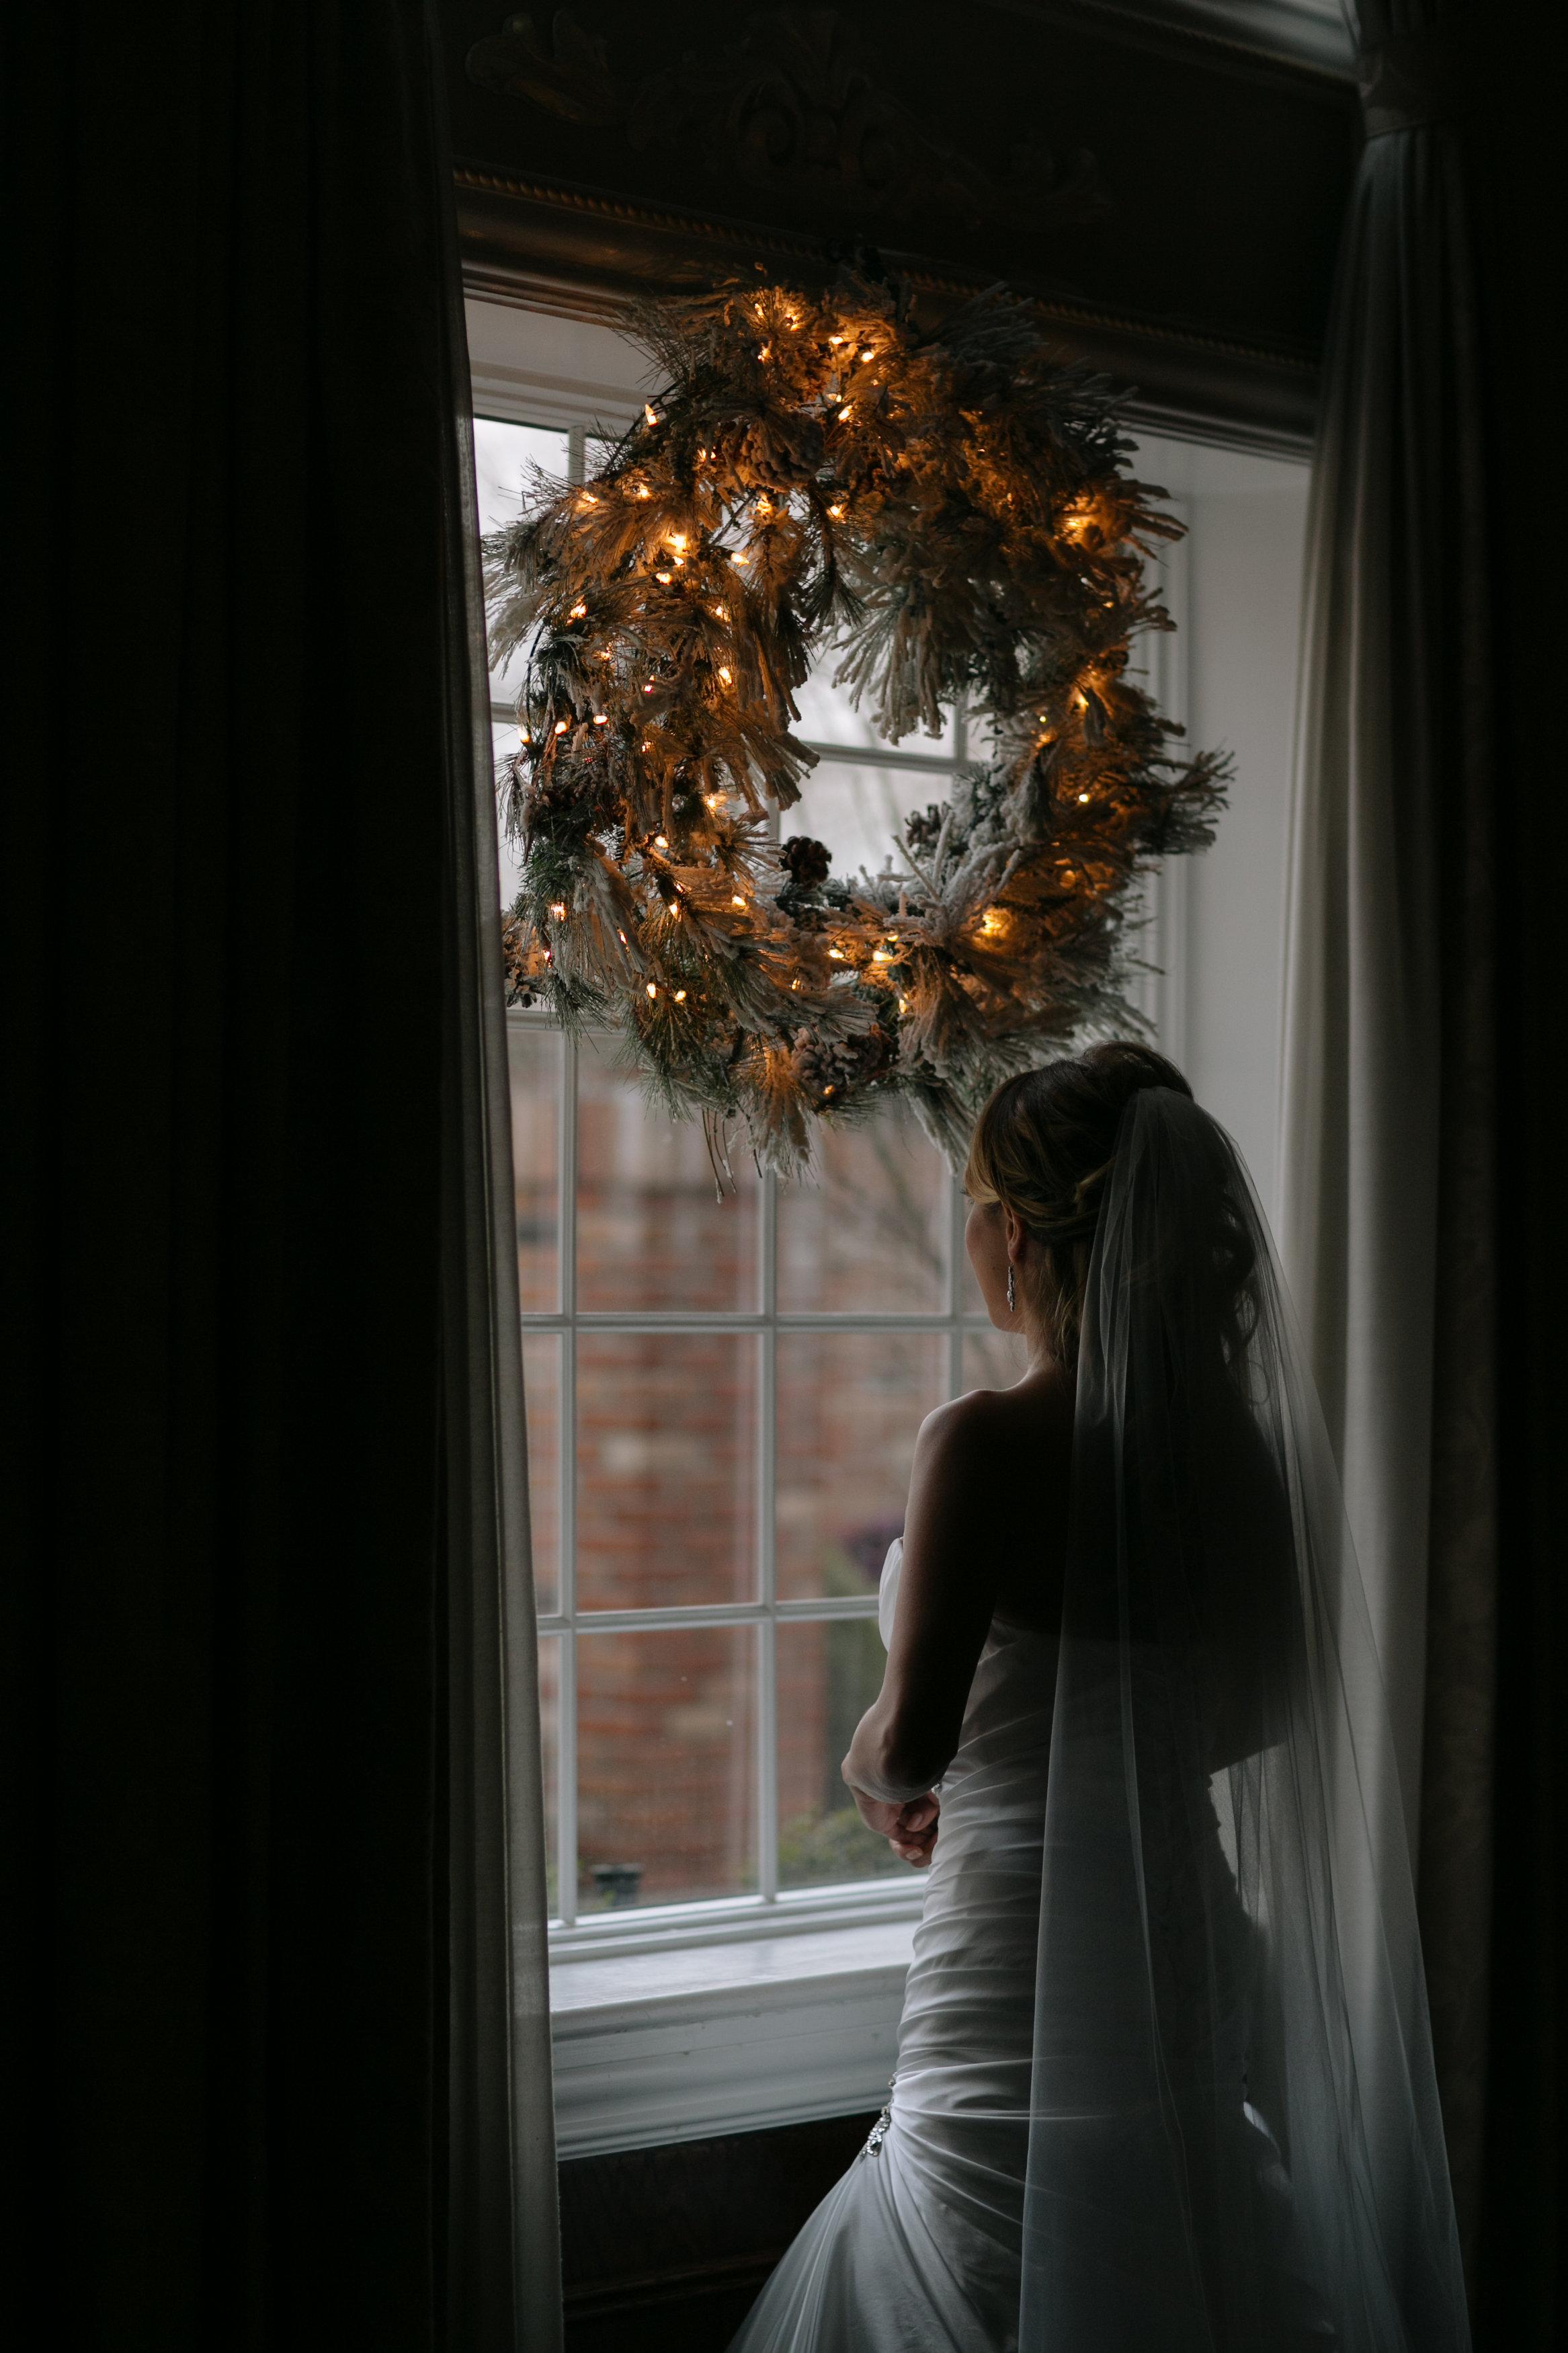 Ceci_New_York_Custom_Invitation_ New_Jersey_Wedding_Luxury_Personalized_Ceci_Style_Bride_Foil_Stamping31.jpg